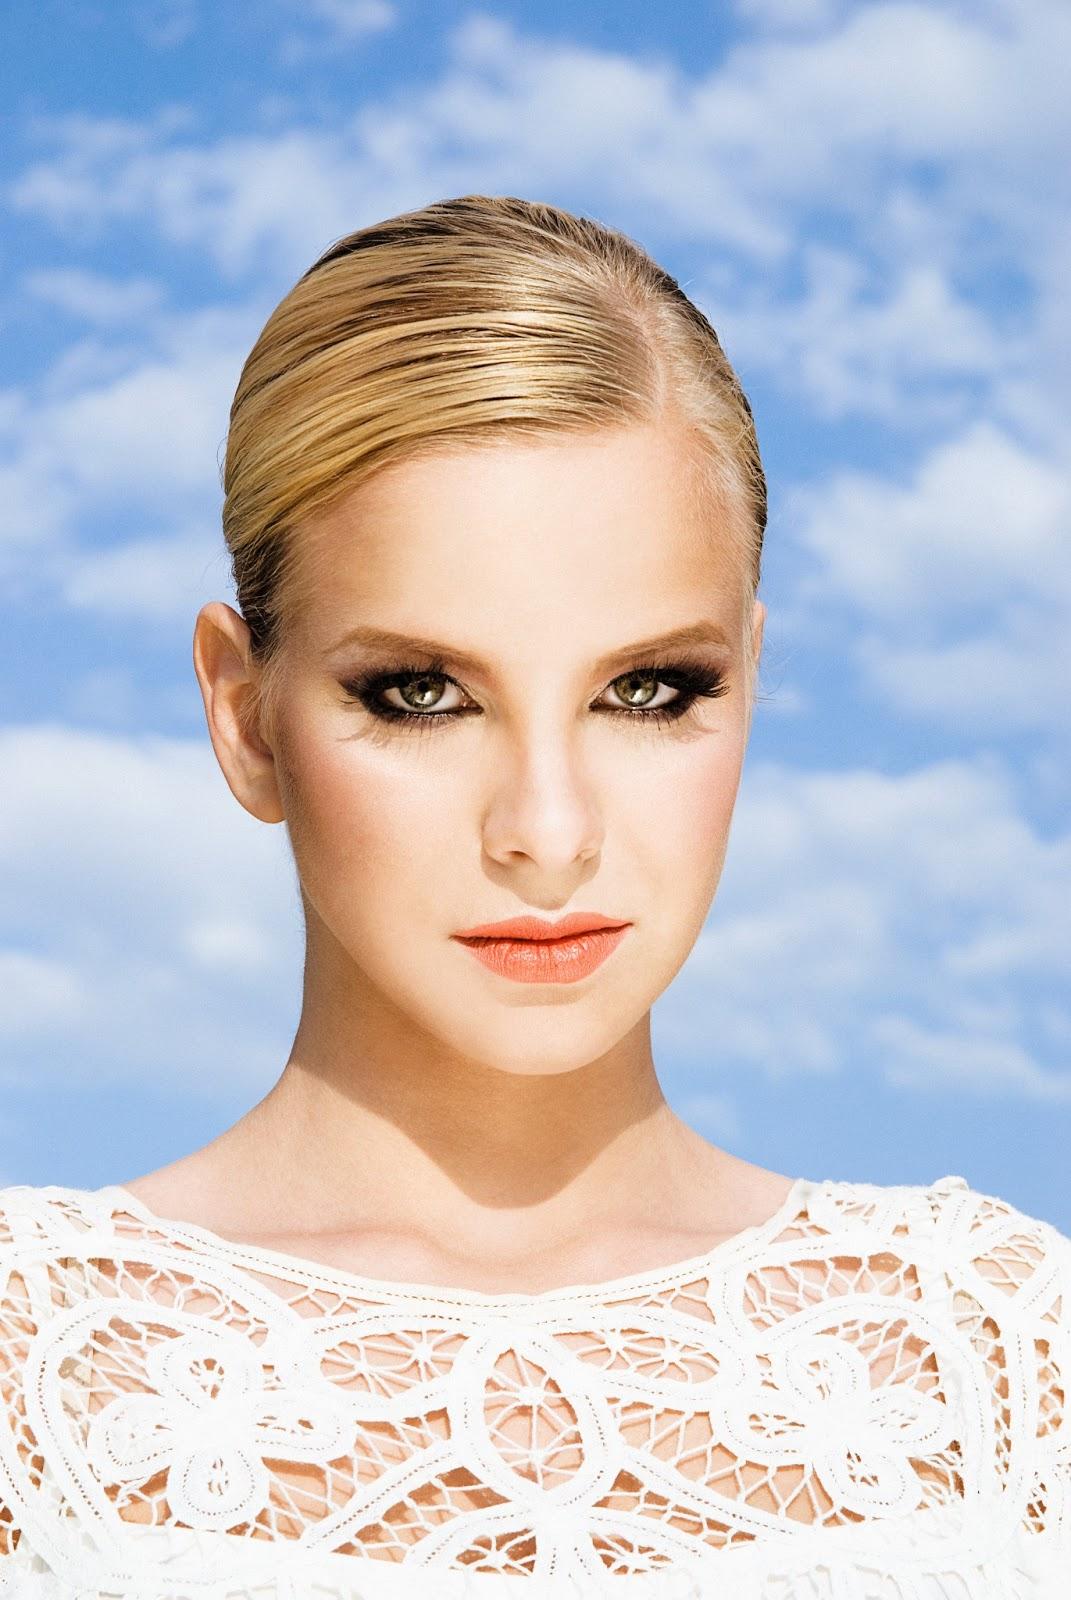 trixie model&ams cherish nude model2